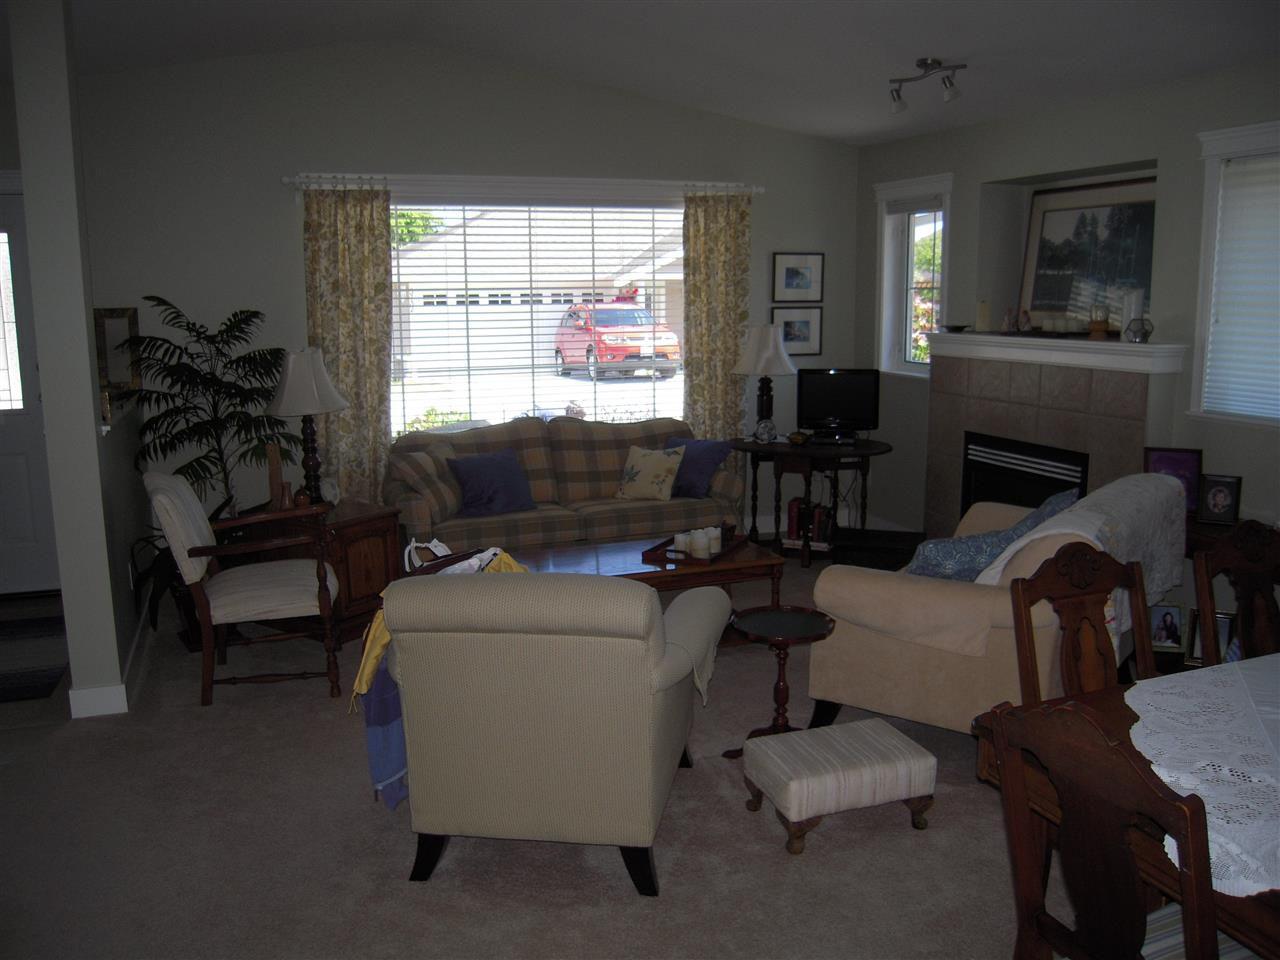 Photo 11: Photos: 5735 EMILY Way in Sechelt: Sechelt District House for sale (Sunshine Coast)  : MLS®# R2179124